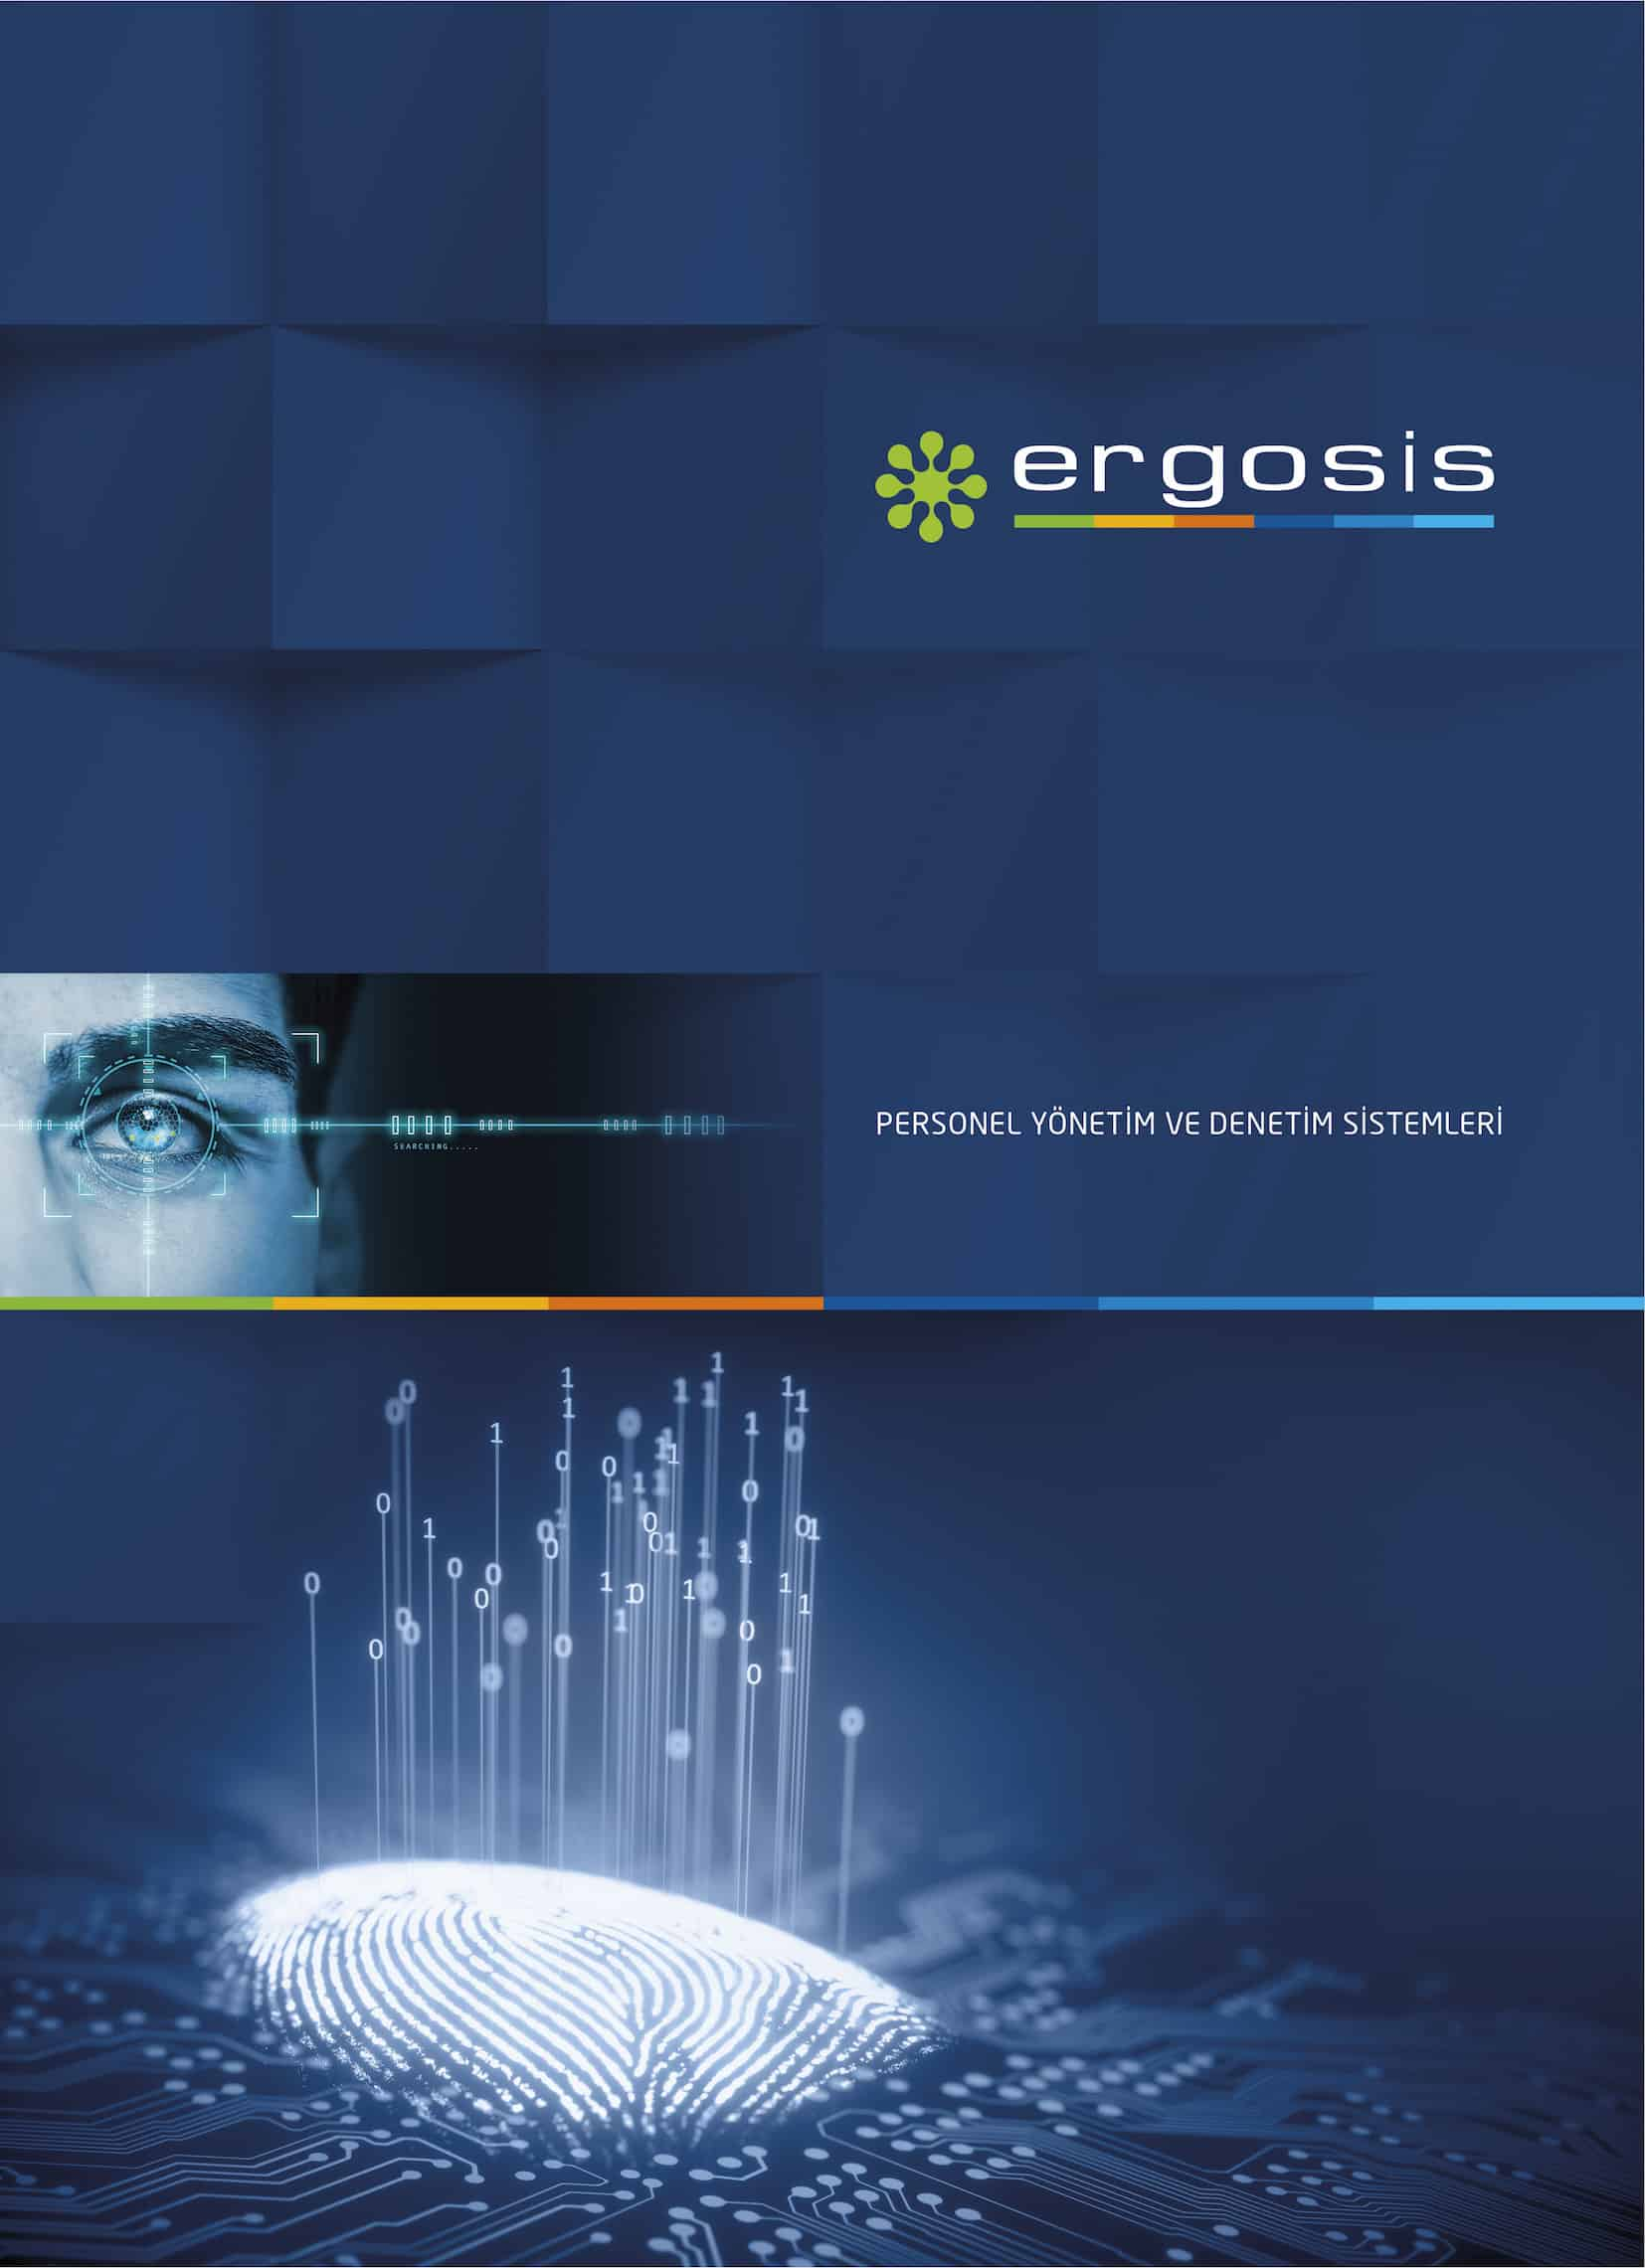 ERGOSIS BROSUR 2 - 220x300 - 3 tam kulaklı